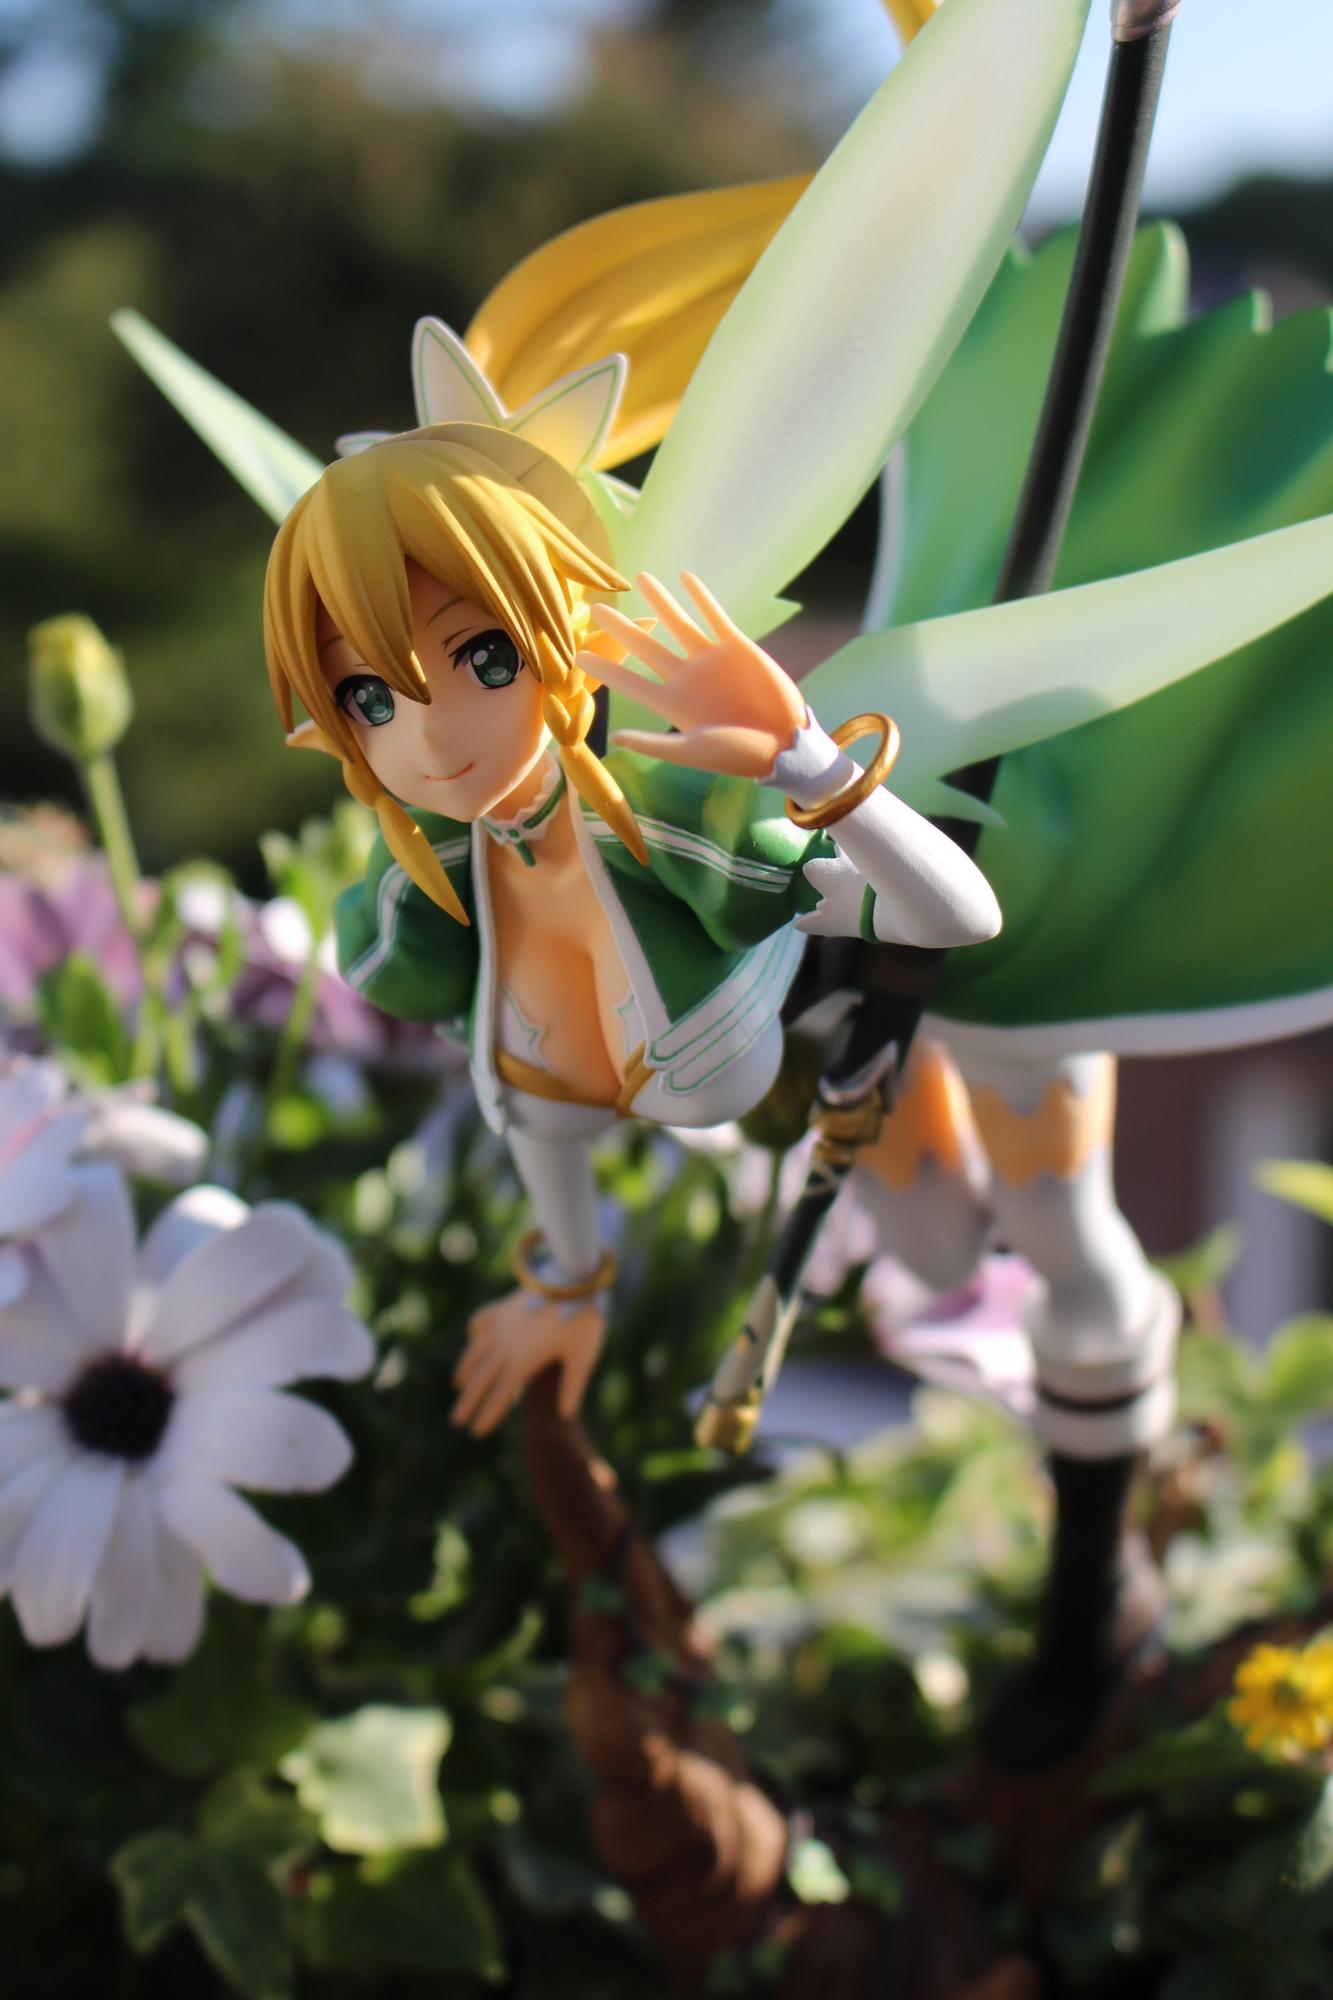 kotobukiya ascii_media_works kojima_shou sword_art_online kawahara_reki leafa